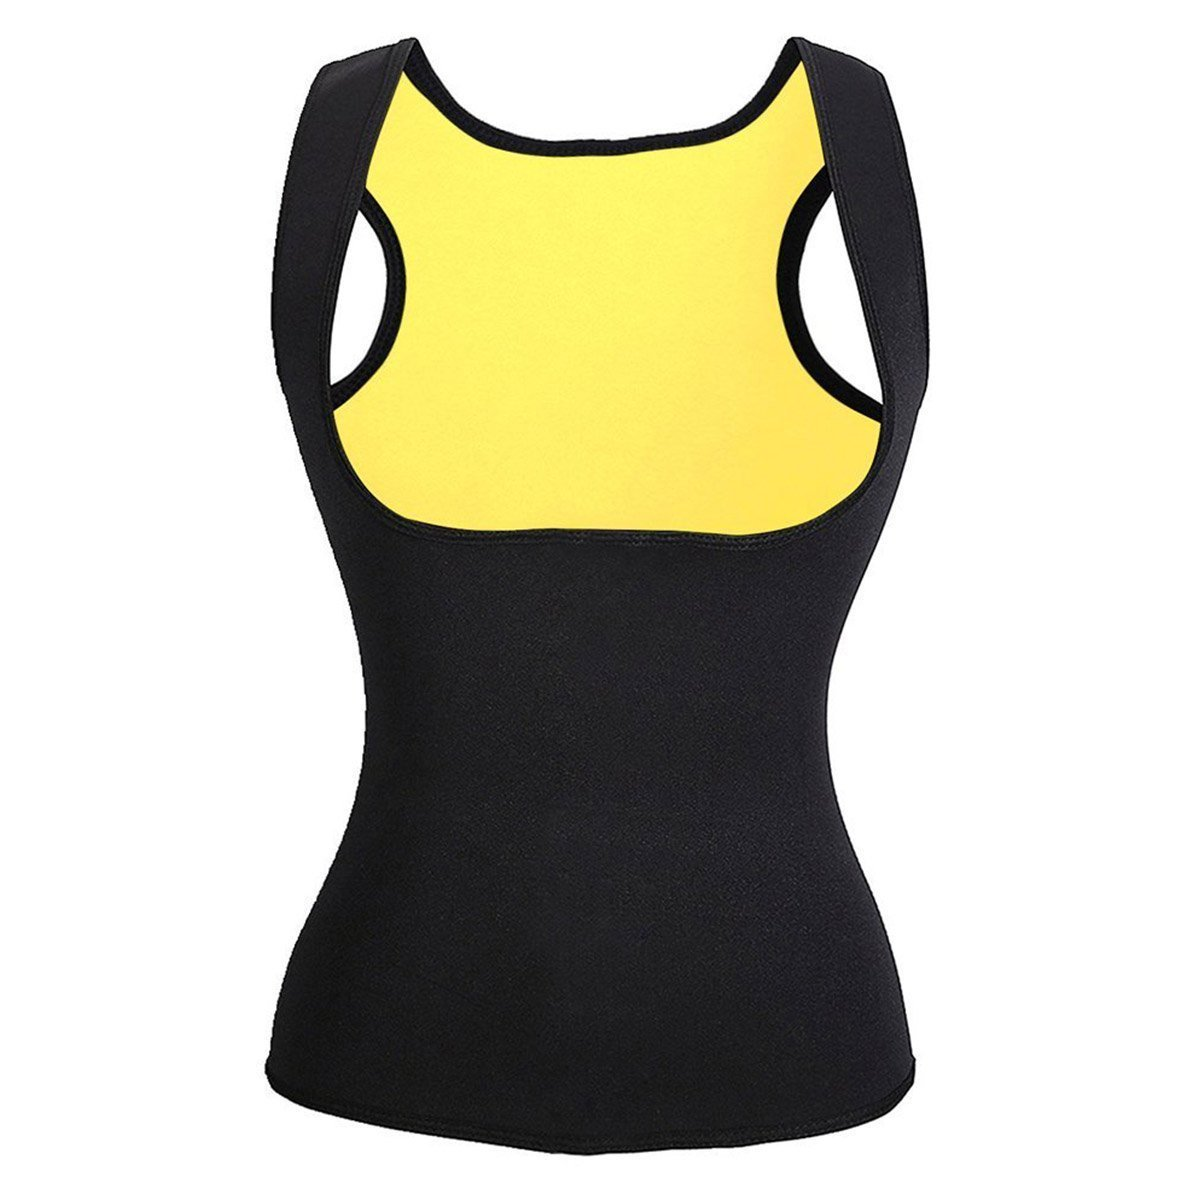 Movwin Womens Body Shaper Tank Top Hot Sweat Slimming Neoprene Shirt Vest Waist Cincher Girdle for Weight Loss No Zipper (3XL, Black)